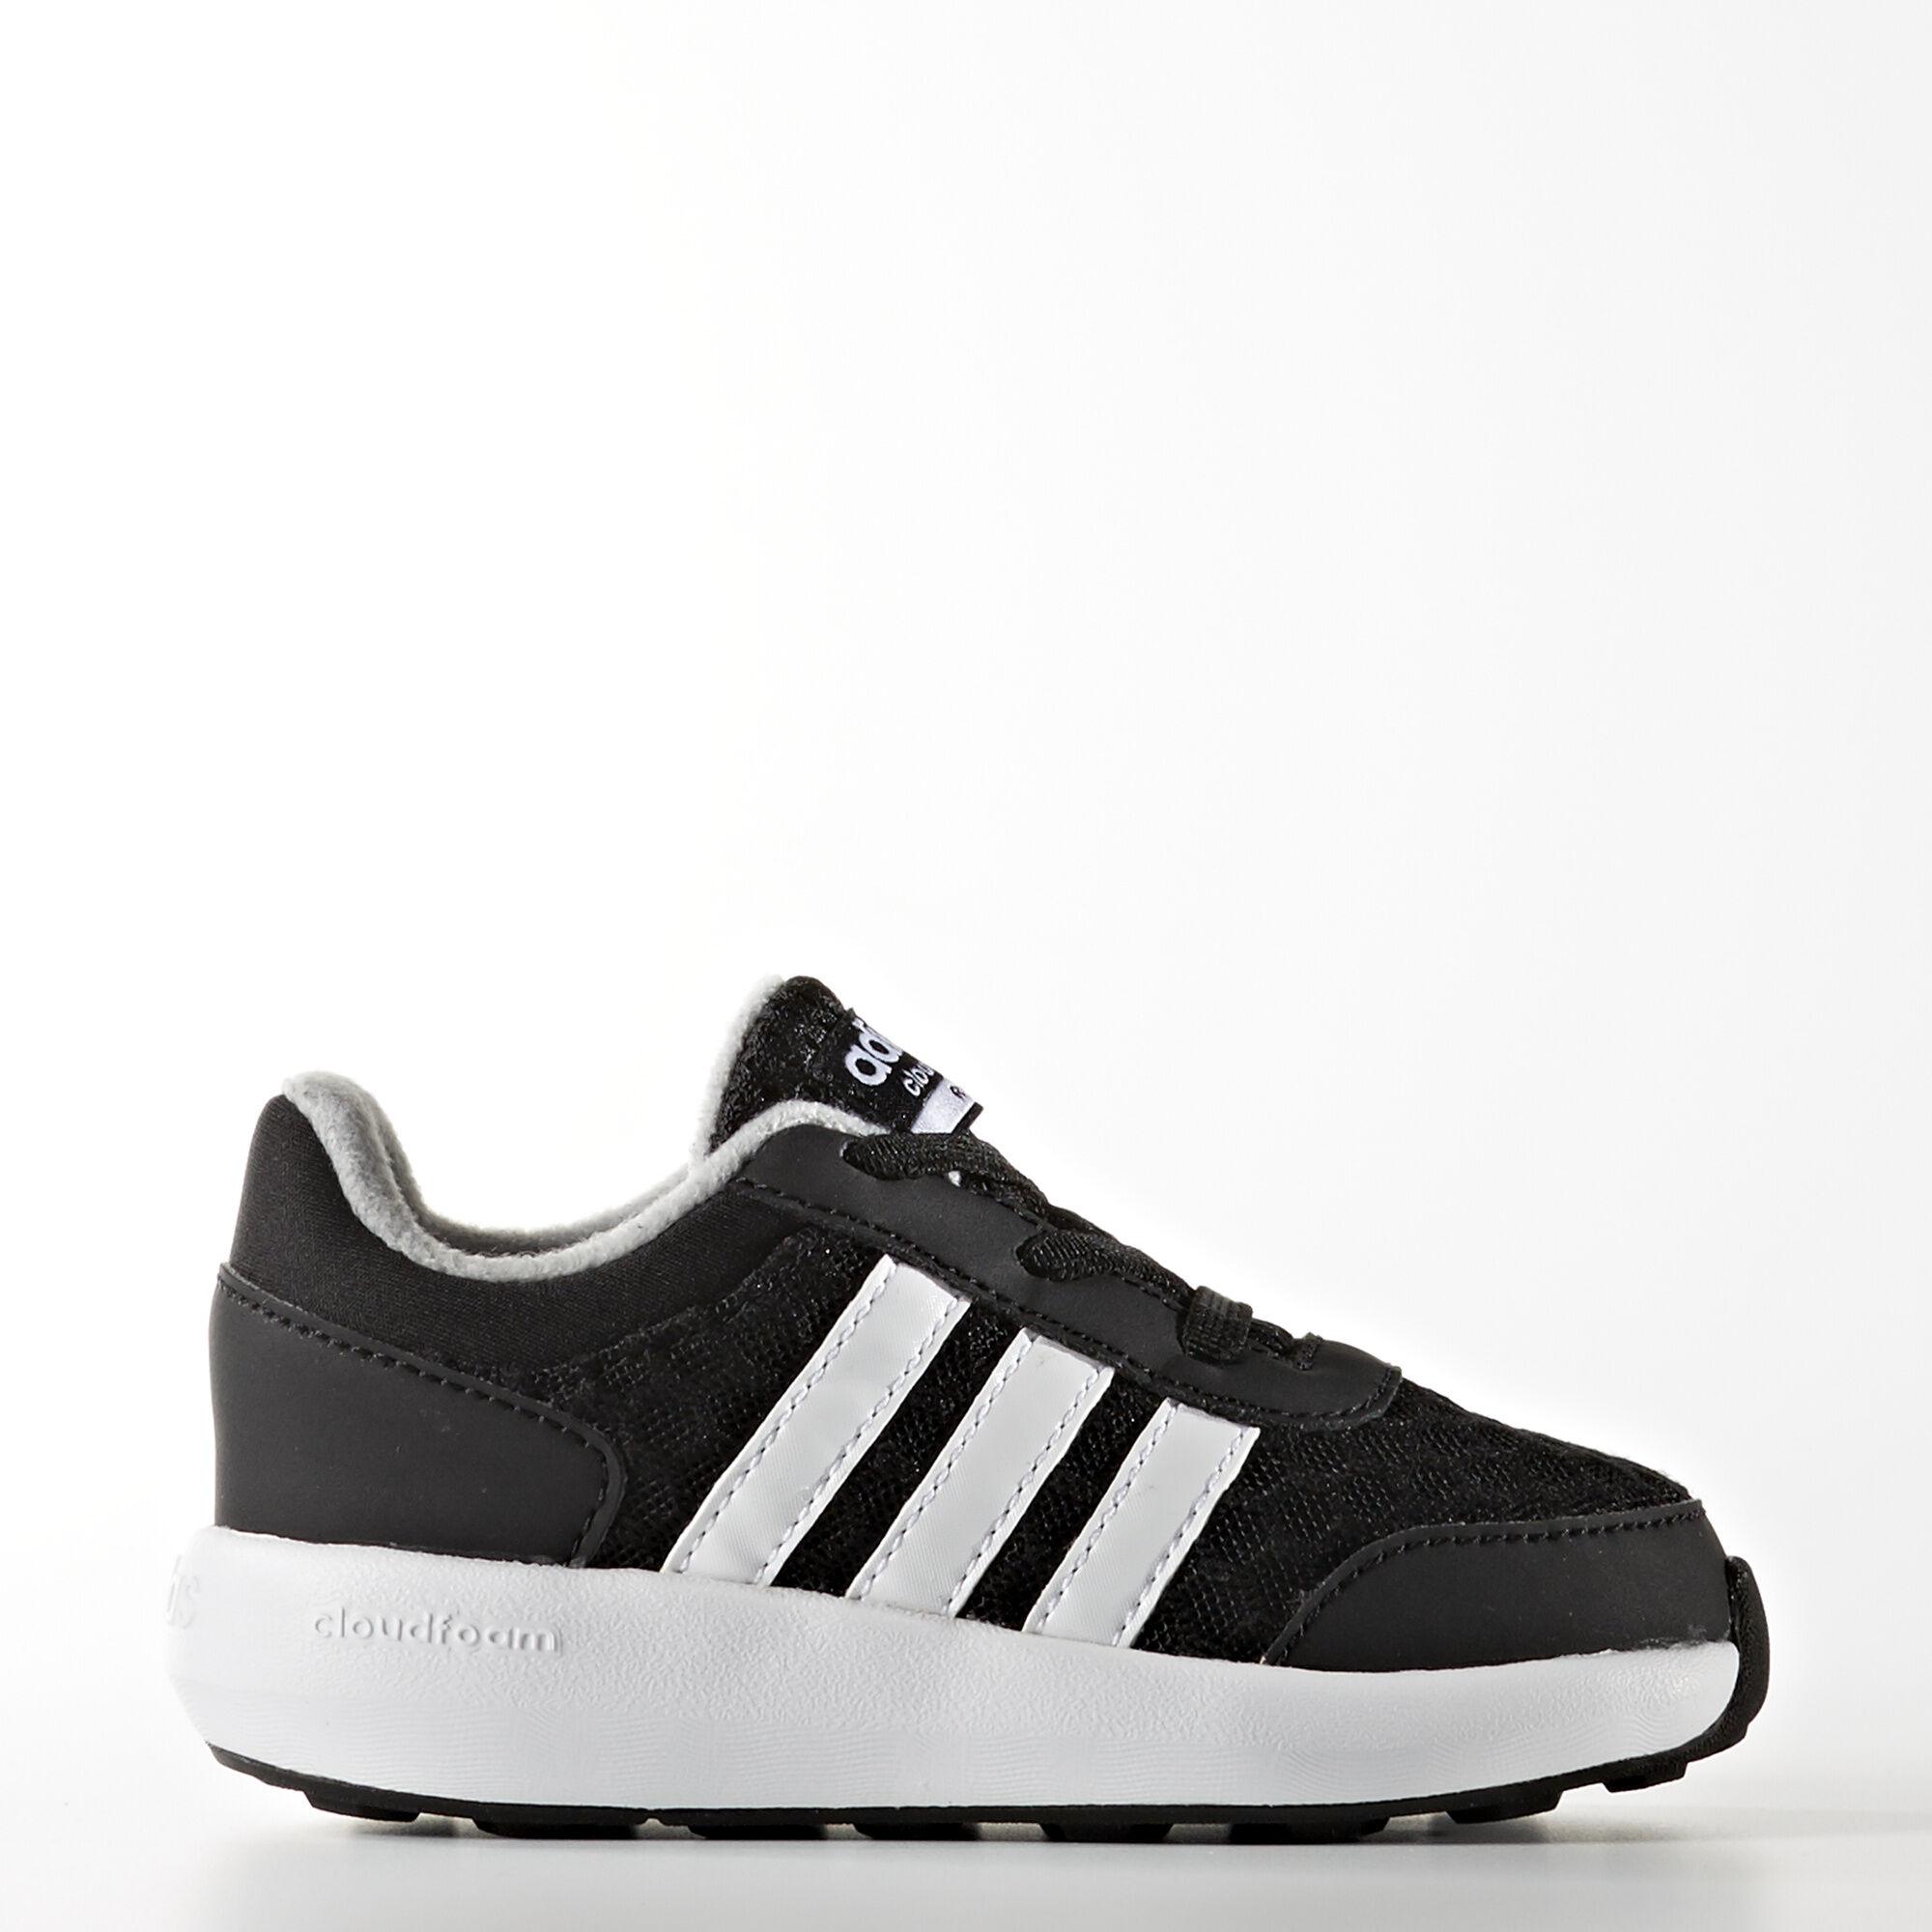 Adidas Neo Cloudfoam Race Net Shoes